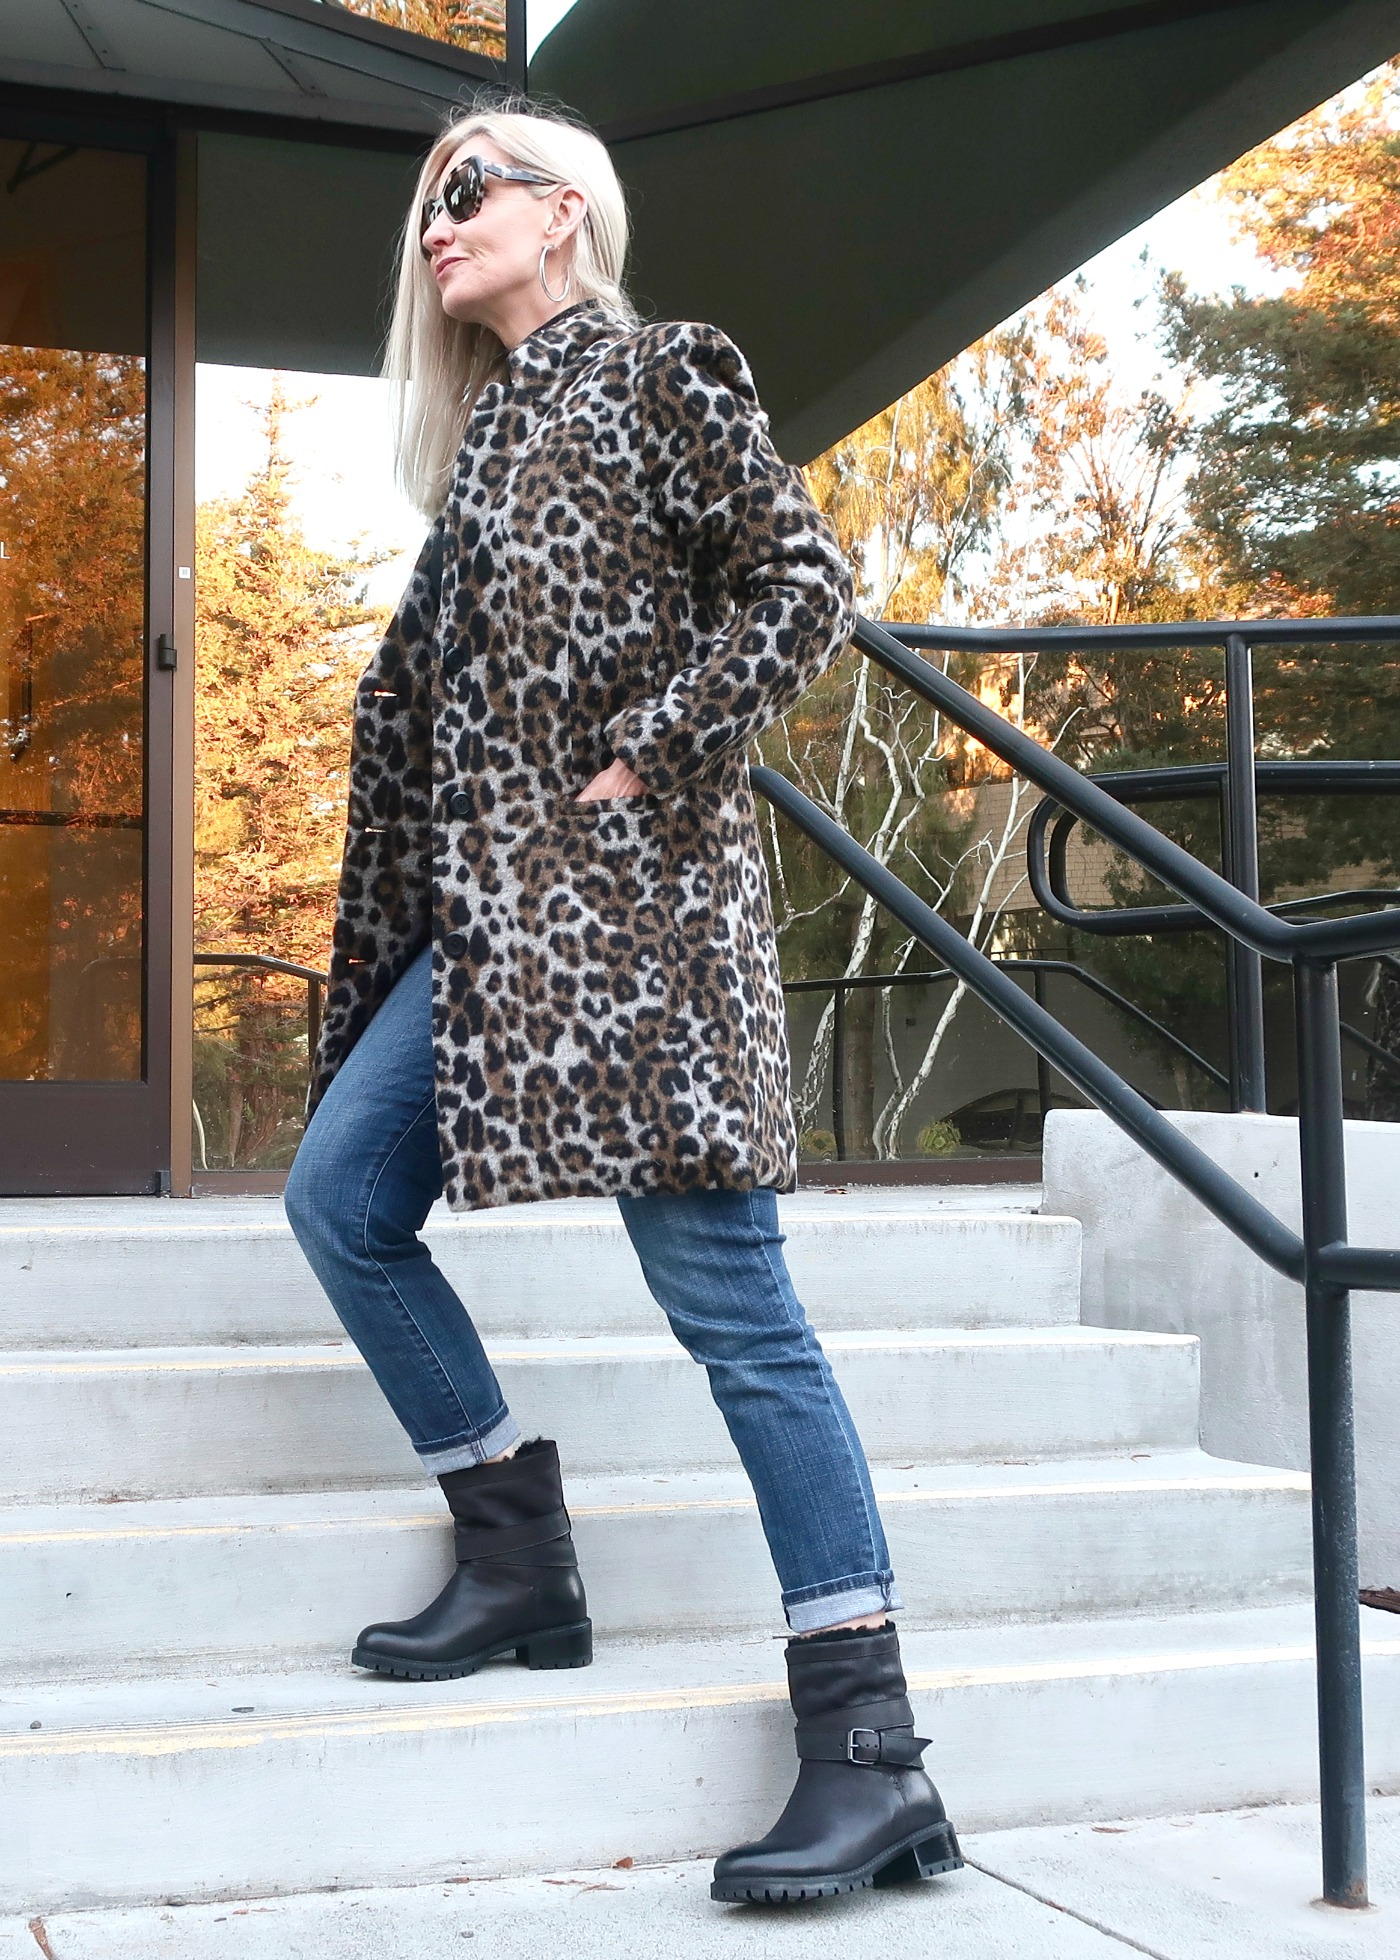 winter wardrobe basics, capsule wardrobe over 40